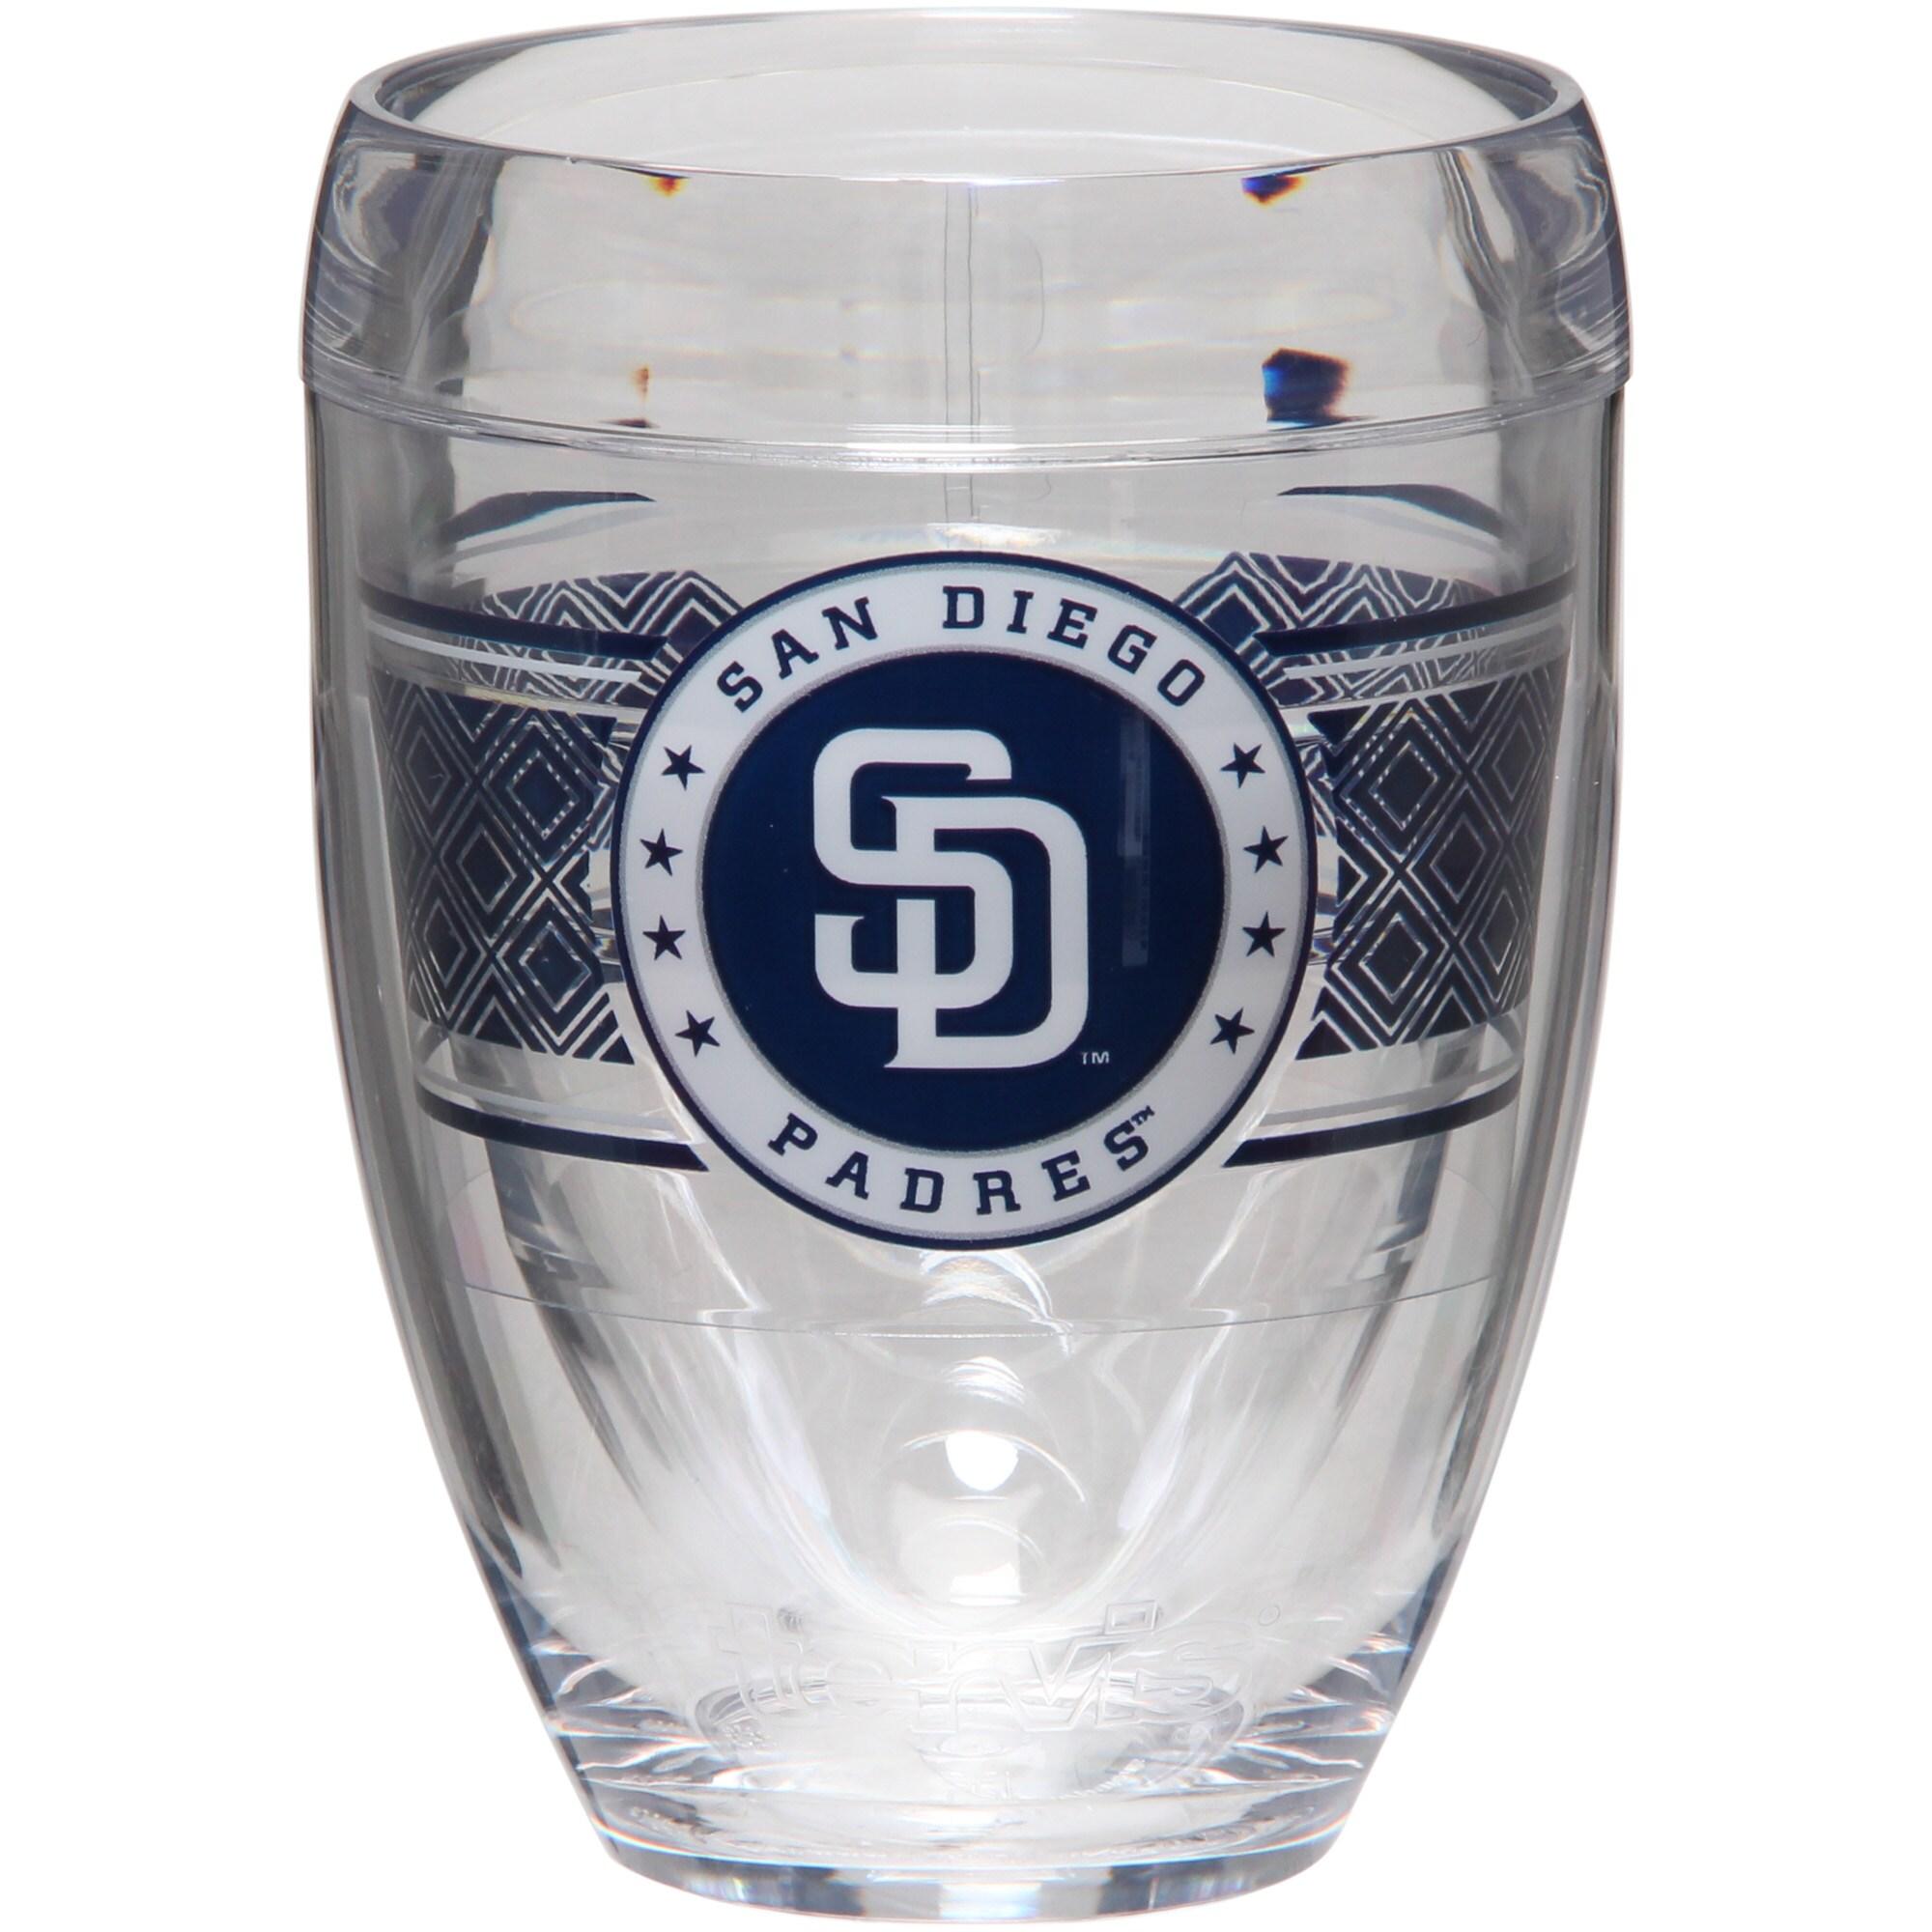 San Diego Padres Tervis 9oz. Stemless Wine Glass